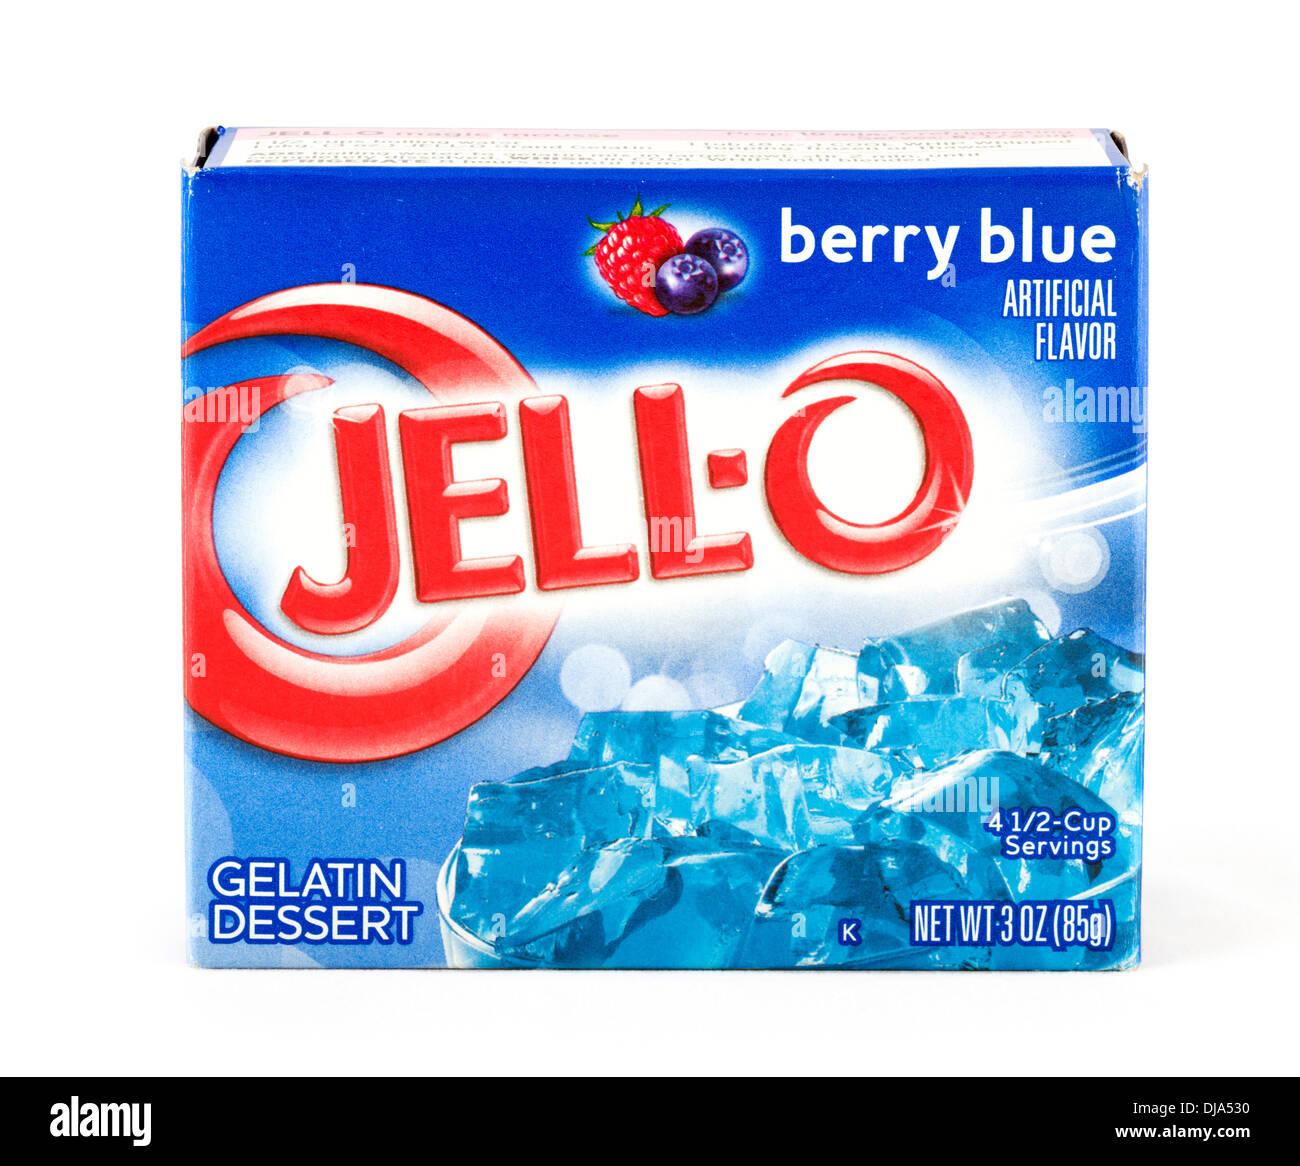 Packet of Jell-O gelatin dessert, USA - Stock Image